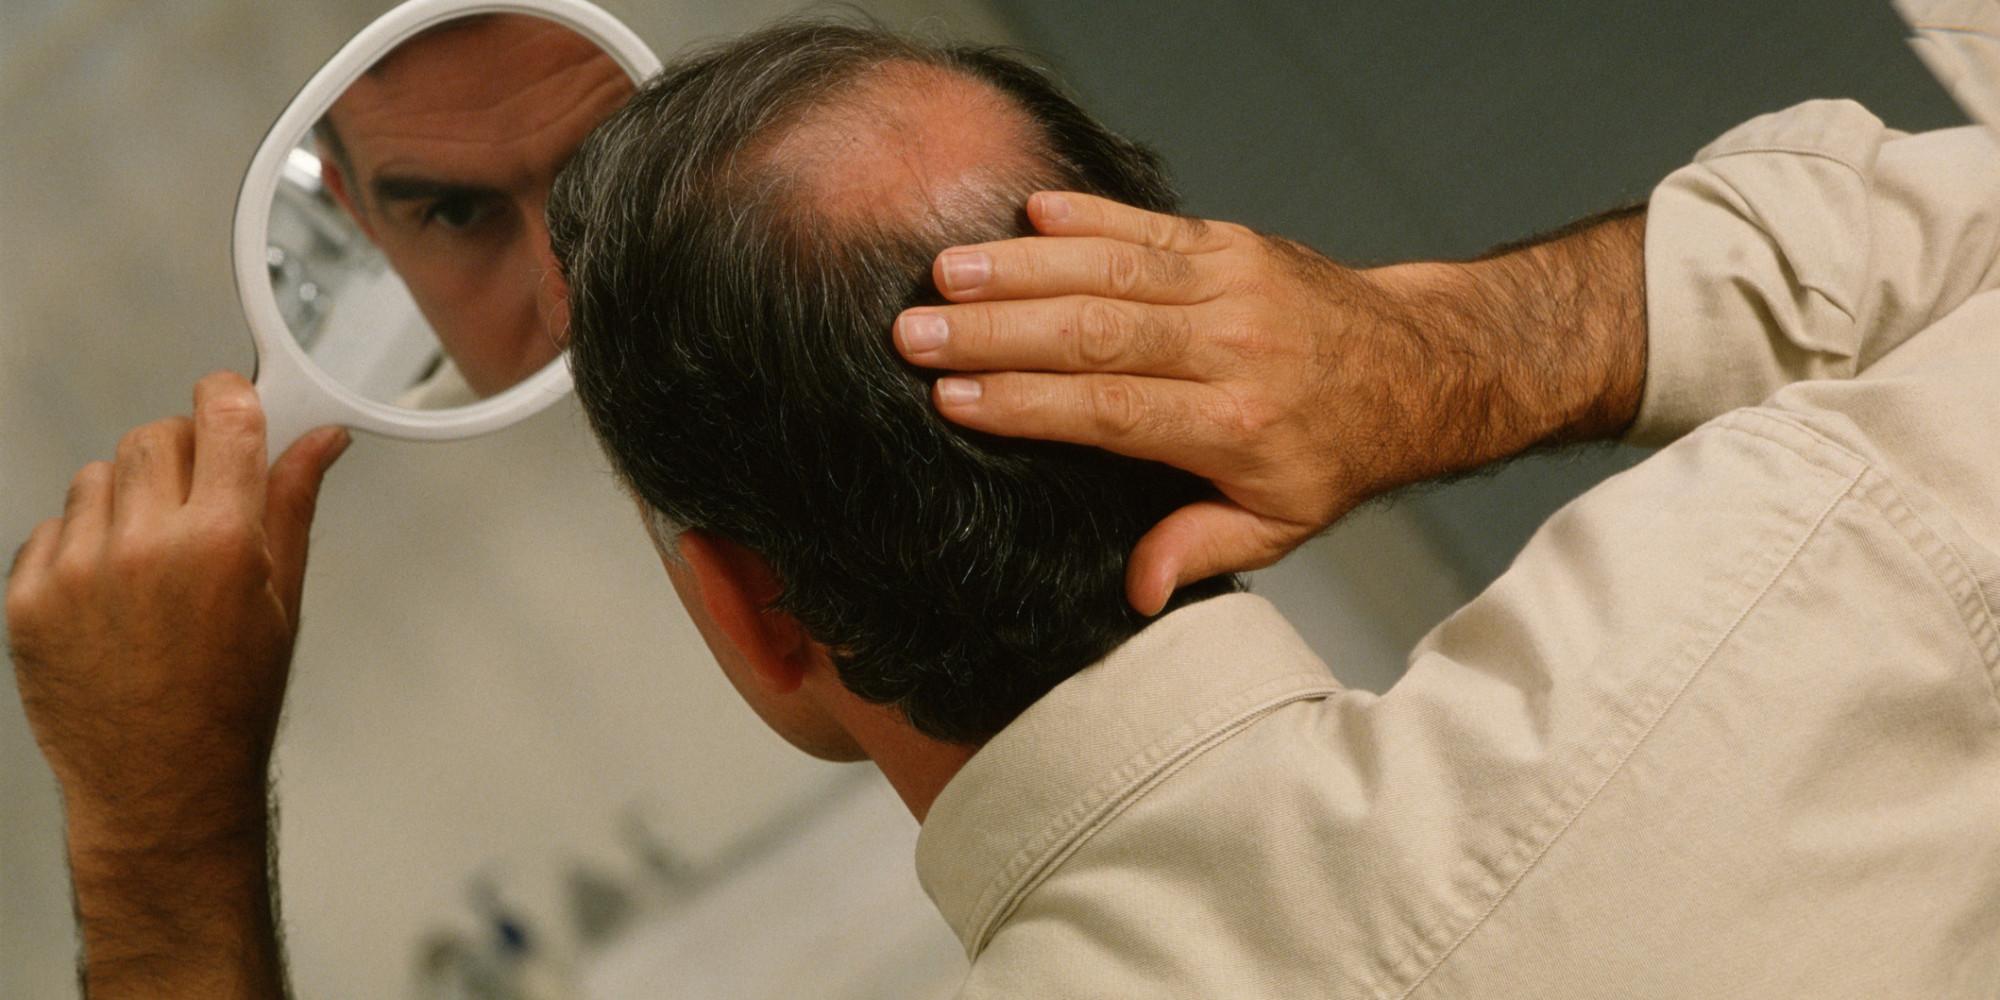 Hilfe Bei Schuppen Und Haarausfall